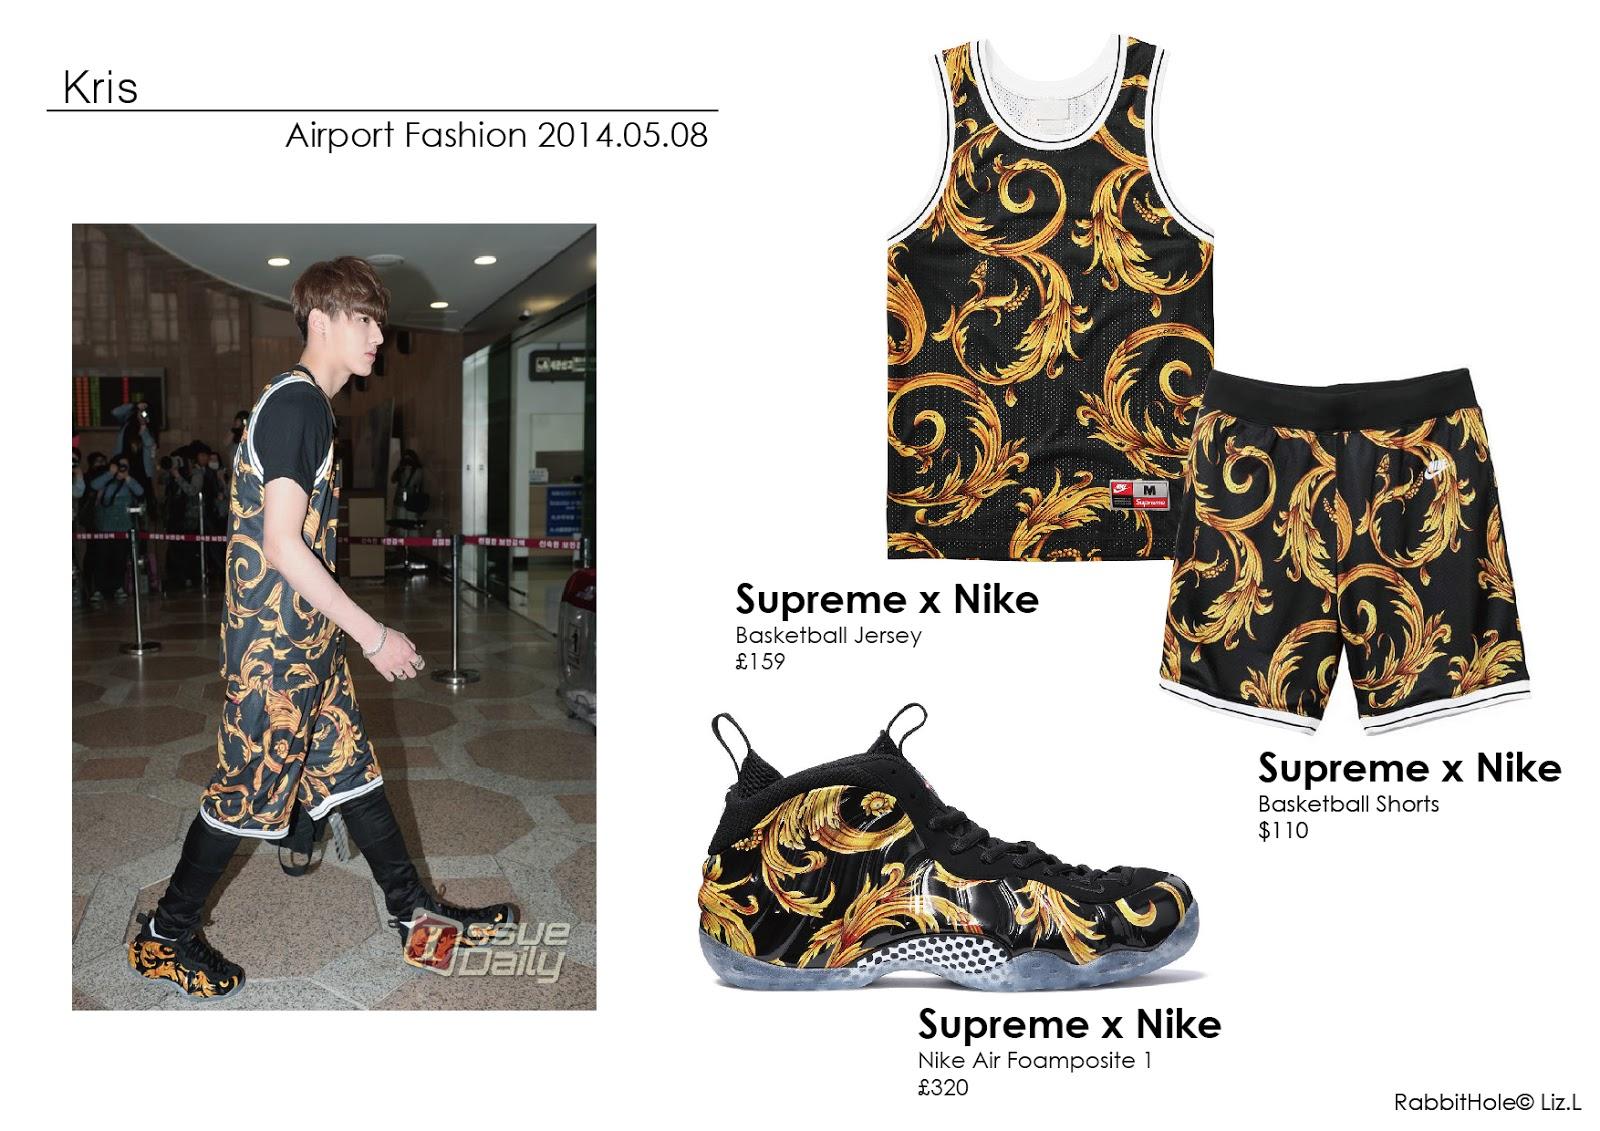 6d9d432c13b Room906  Kris Airport Fashion 2014.05.08